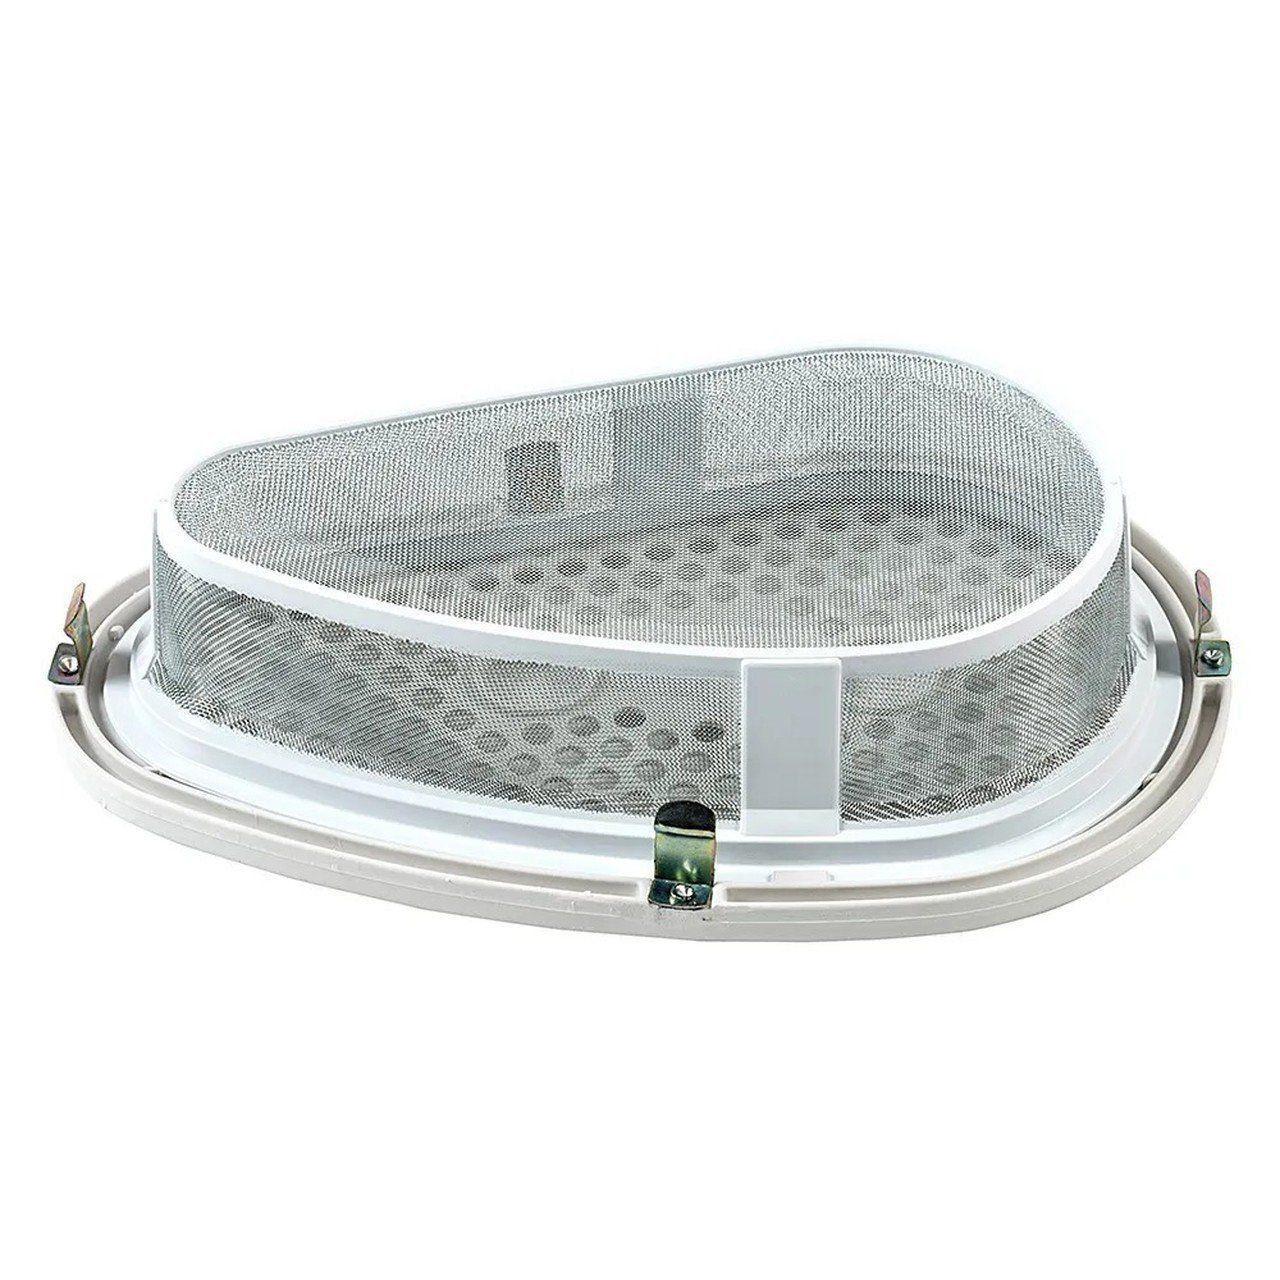 Conjunto Filtro Fiapos Secadora Compacta Brastemp 326015426